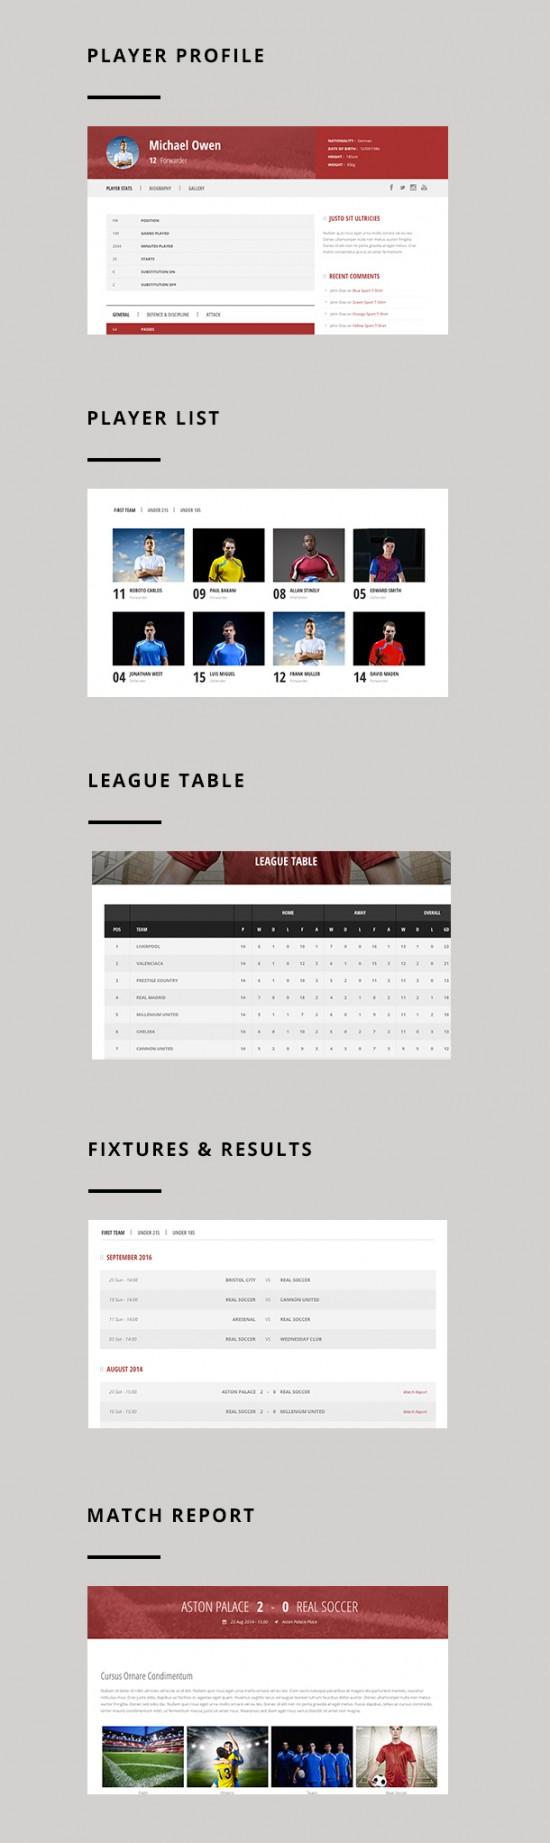 Real_soccer_theme_wp